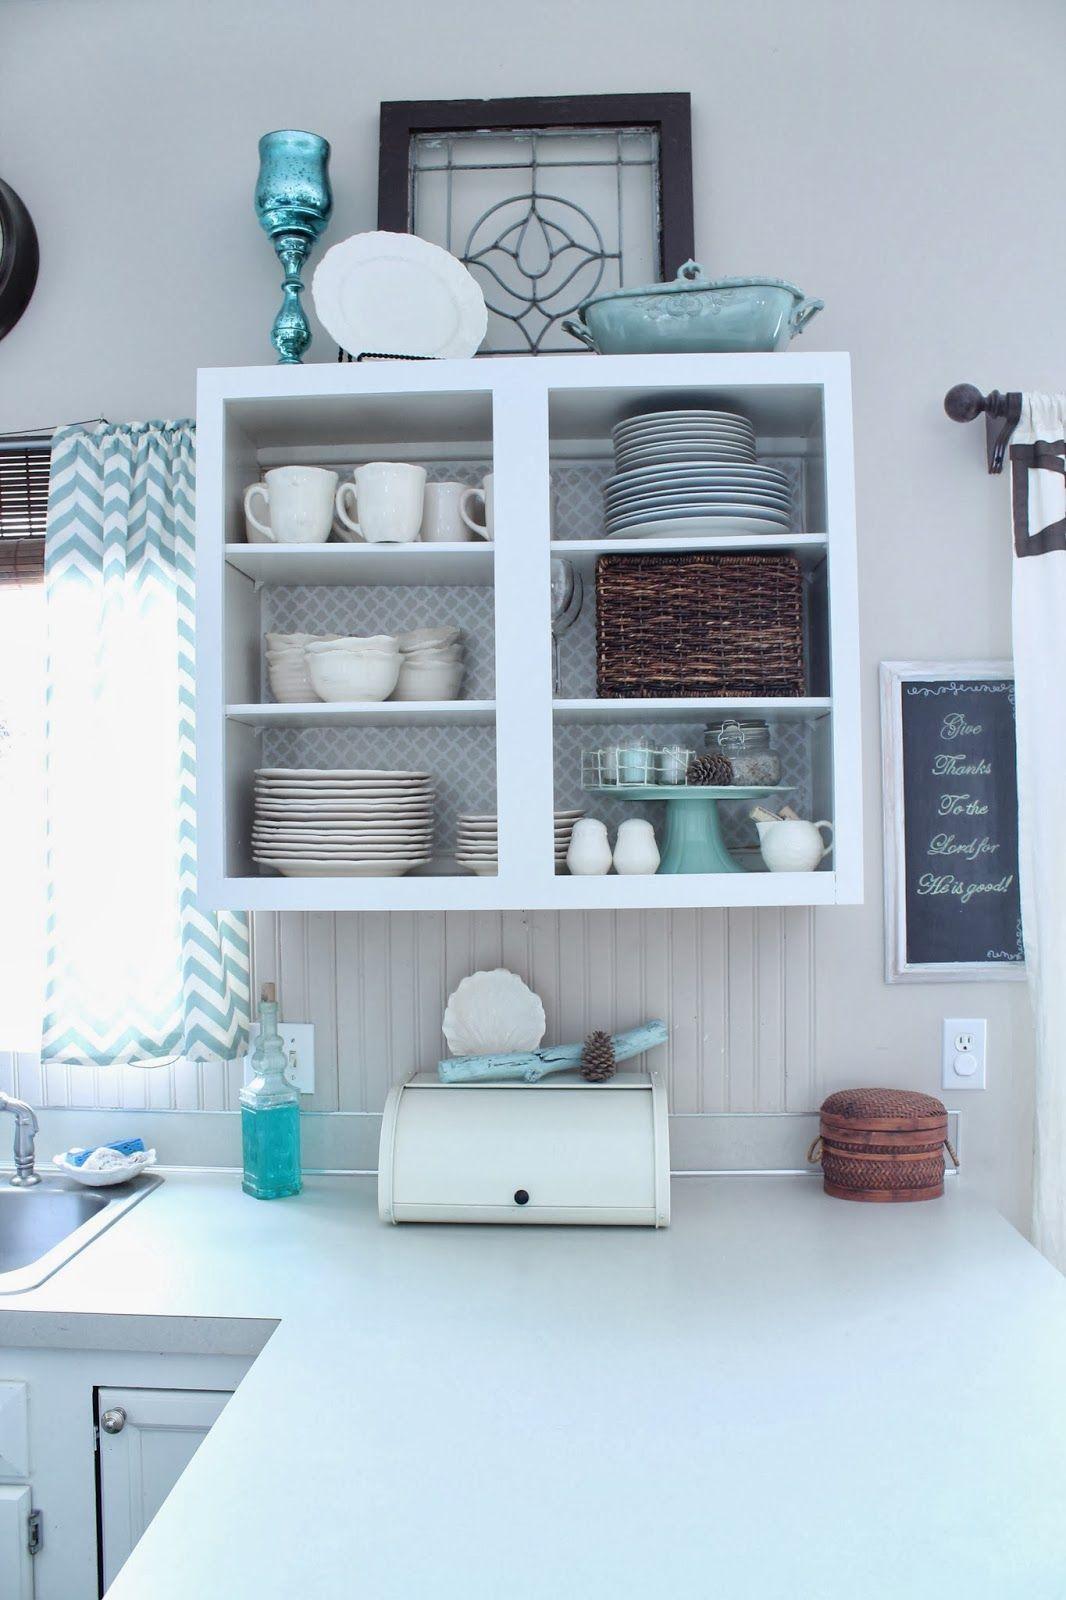 Kitchen Remodel Stage 57   DIY Home Decor Ideas   Pinterest   Stage ...